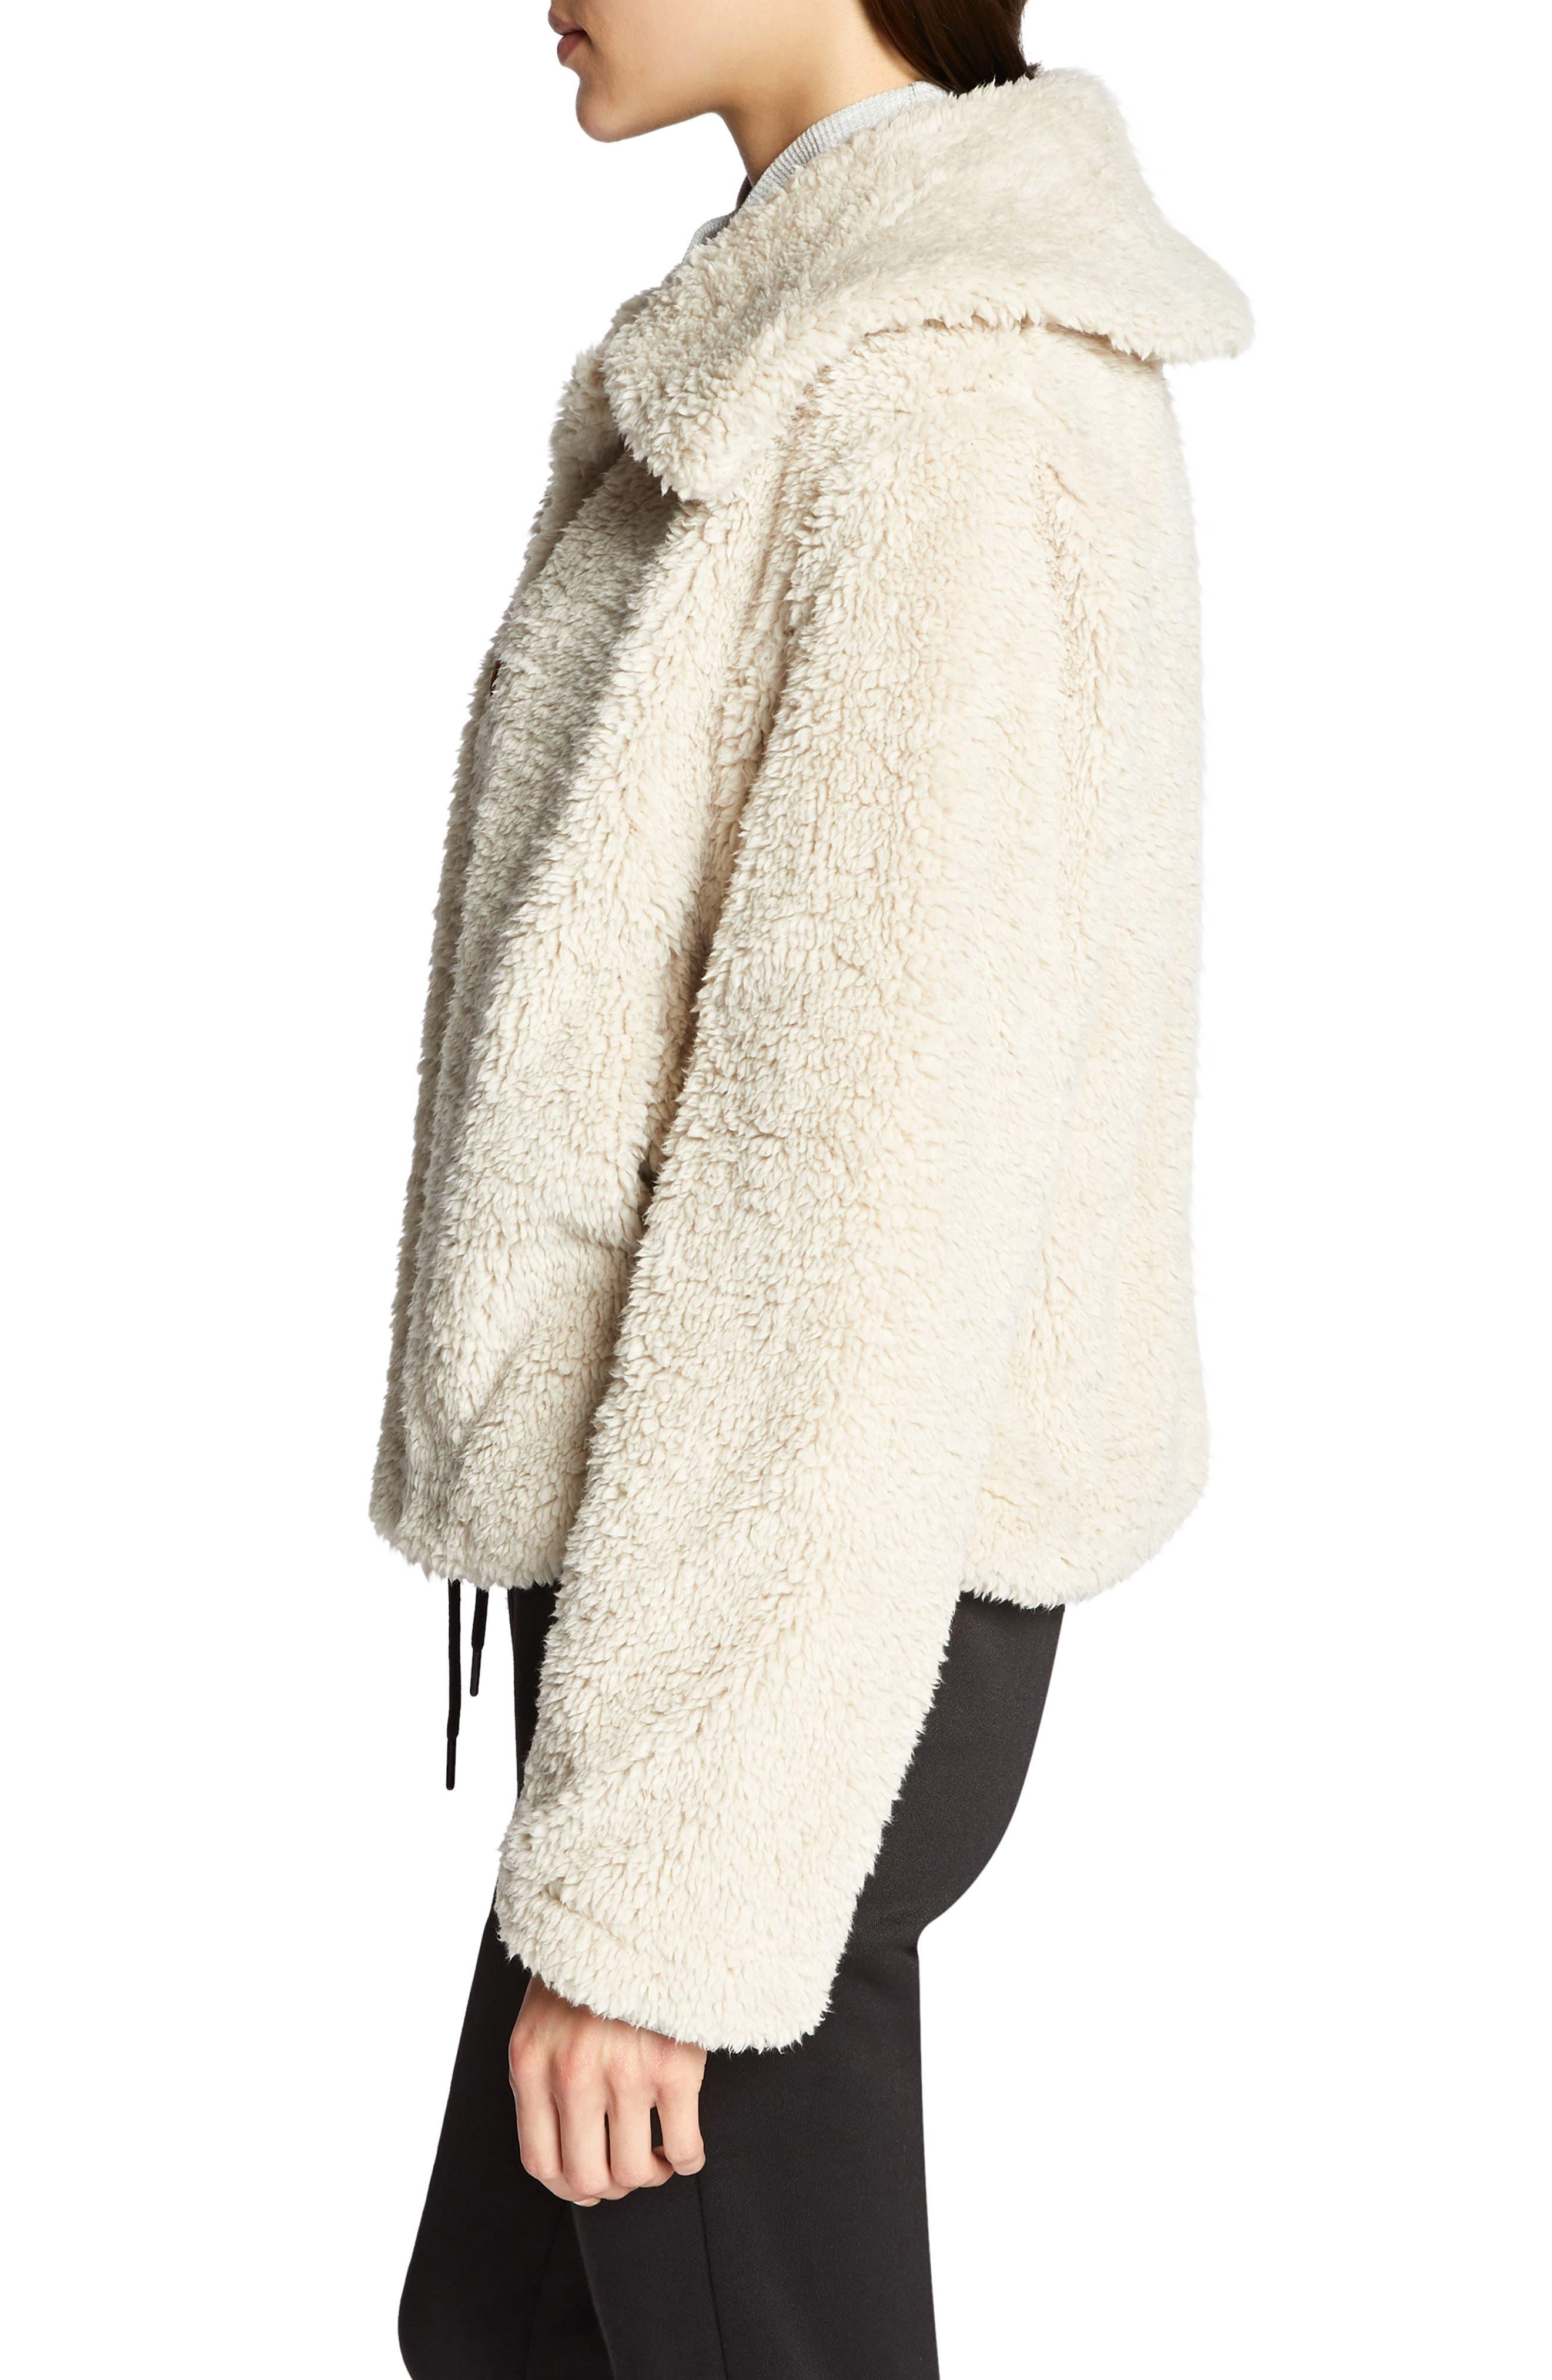 I Feel Luv Faux Fur Sherpa Jacket,                             Alternate thumbnail 3, color,                             CHAMPAGNE